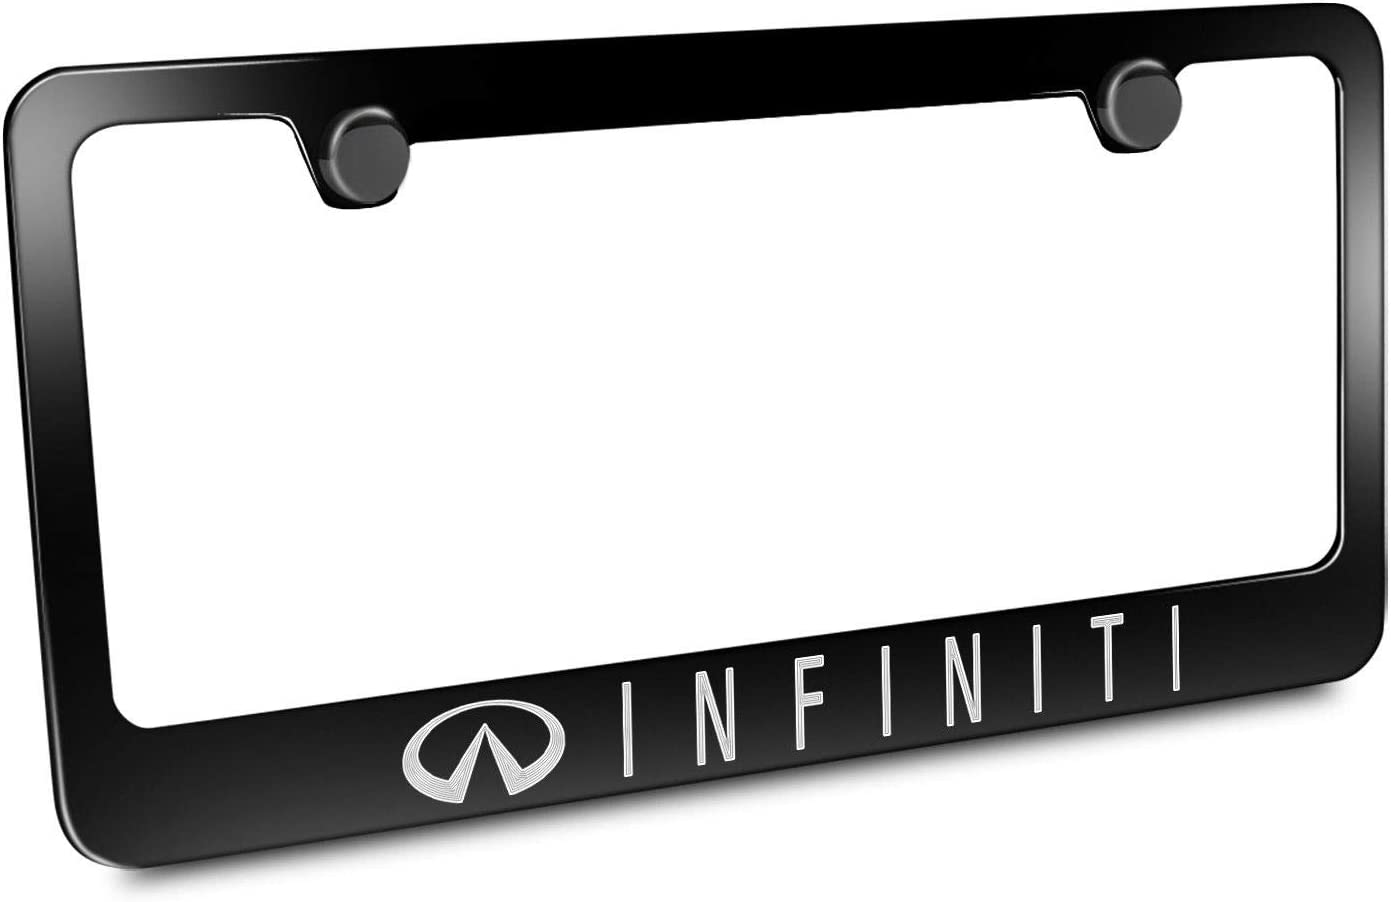 1 Estodia Black Stainless Steel G30 35 FX Q 30 40 50 70 80 License Plate Frame Cover Holder Metal with Screws Caps